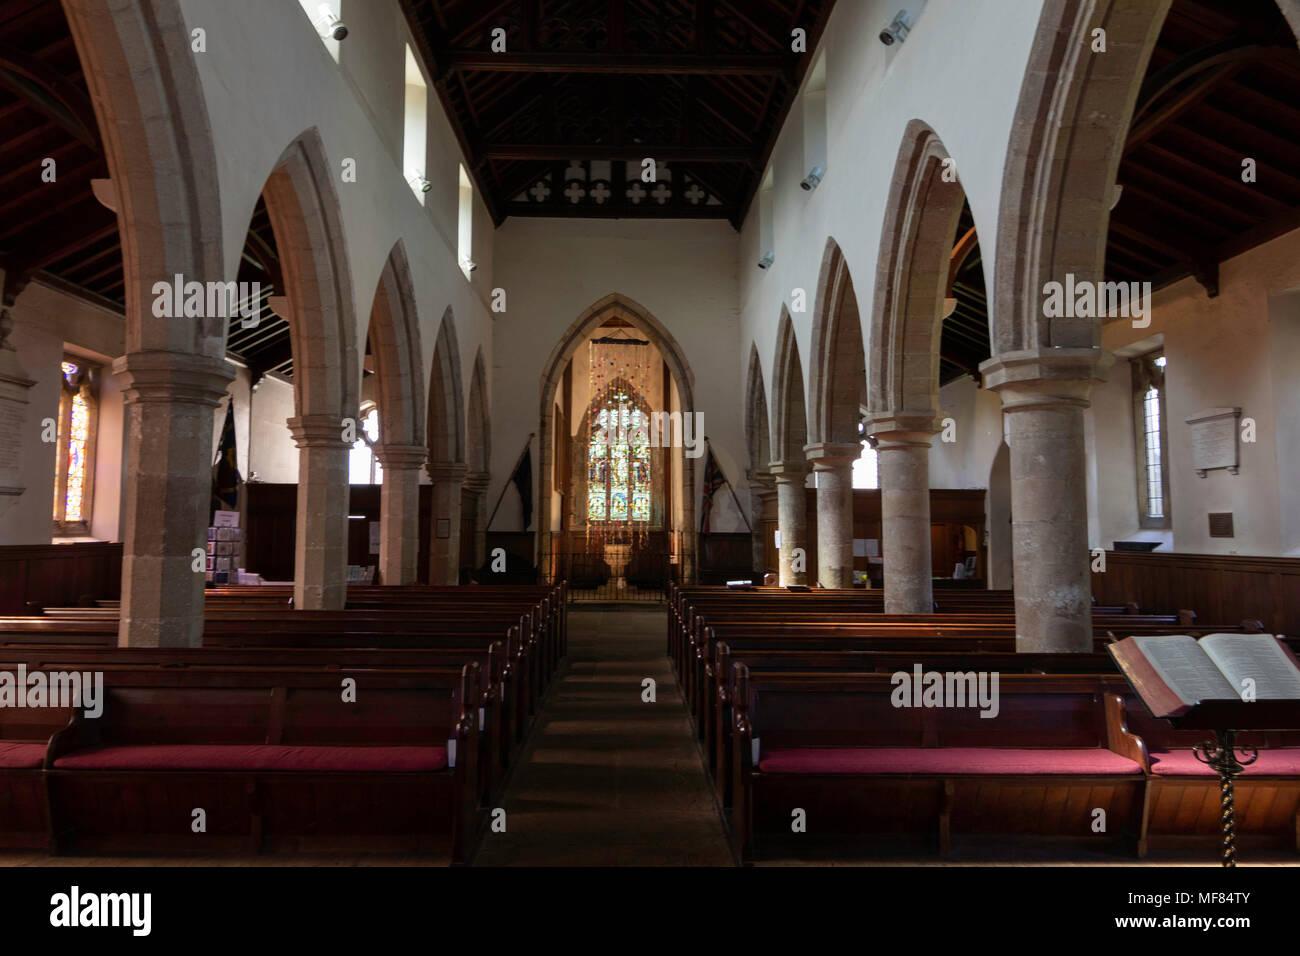 All Saints Church Ripley,intérieur North Yorkshire, Angleterre, Royaume-Uni. Photo Stock